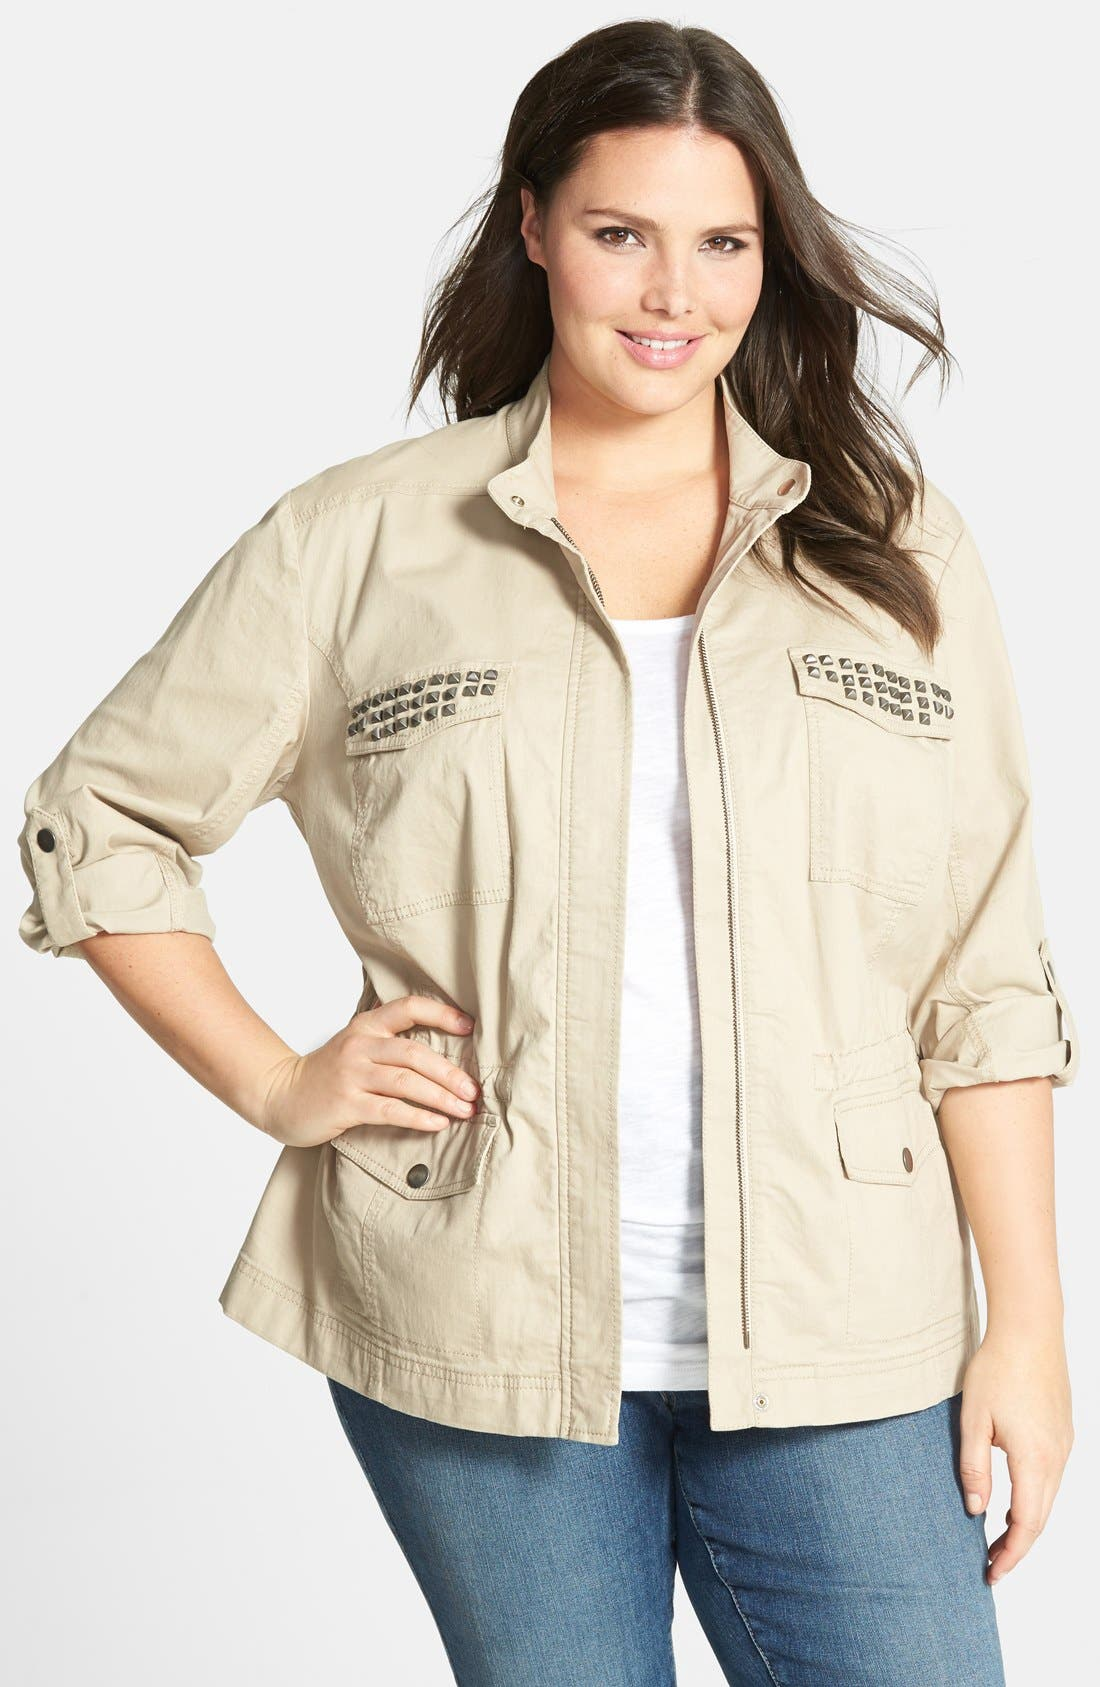 Alternate Image 1 Selected - Sejour 'Megan' Studded Roll Sleeve Jacket (Plus Size)